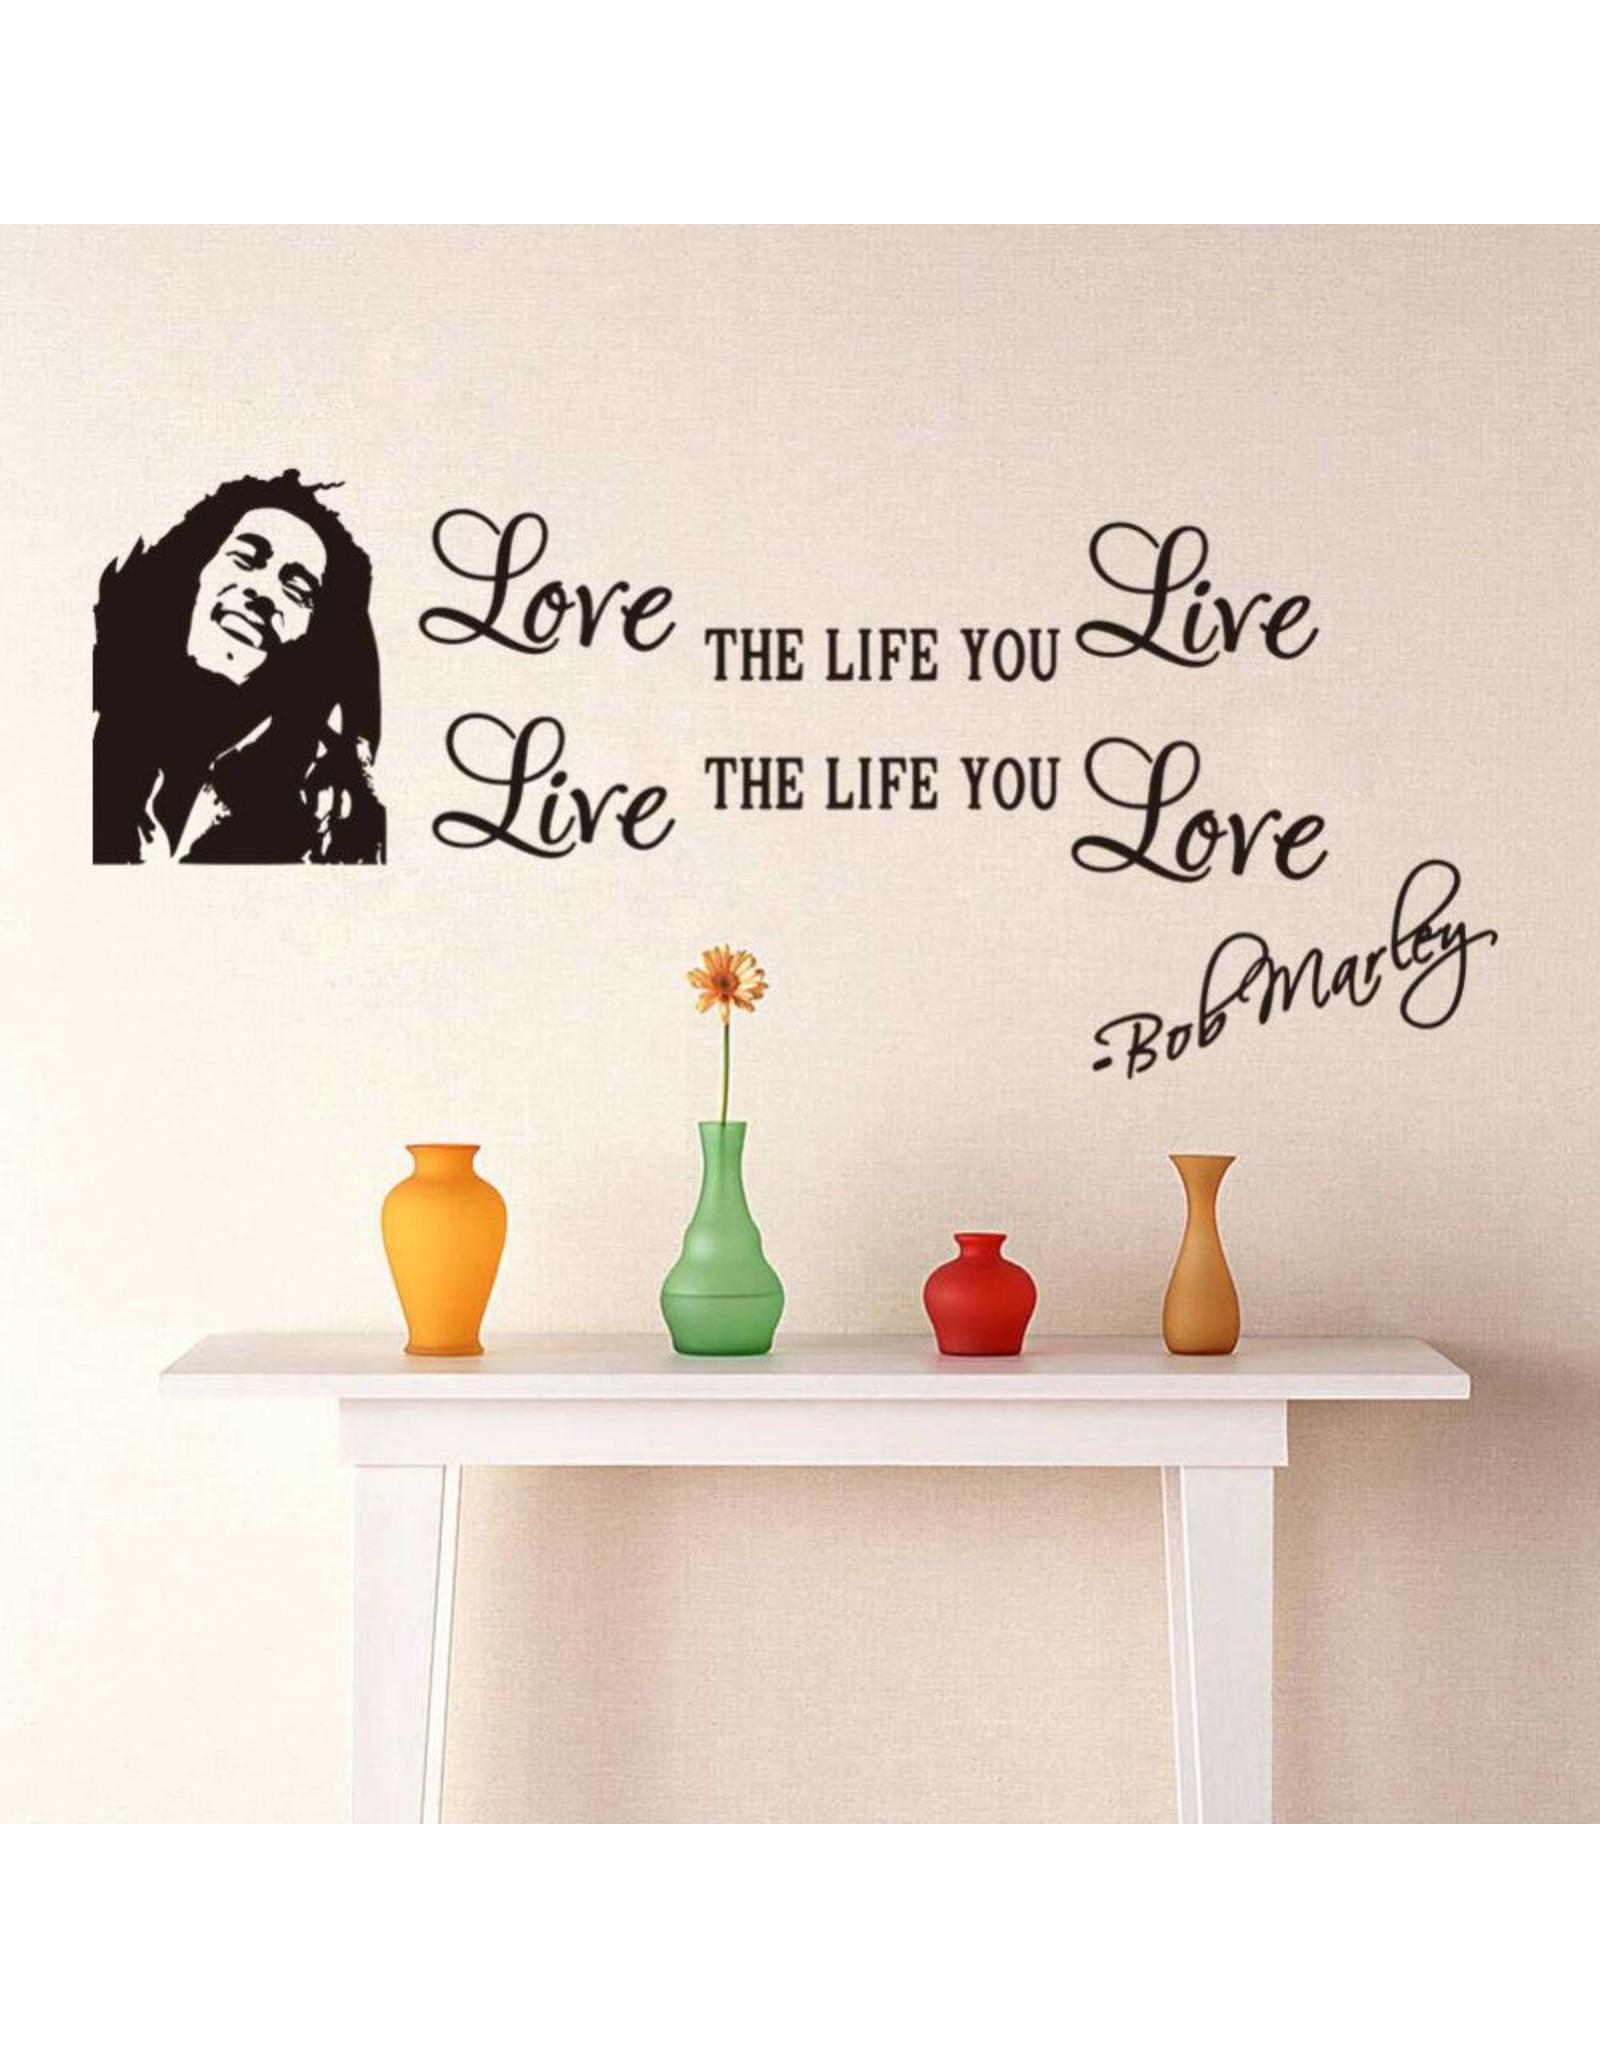 Muurstickers 'Bob Marley' - Body & Soap